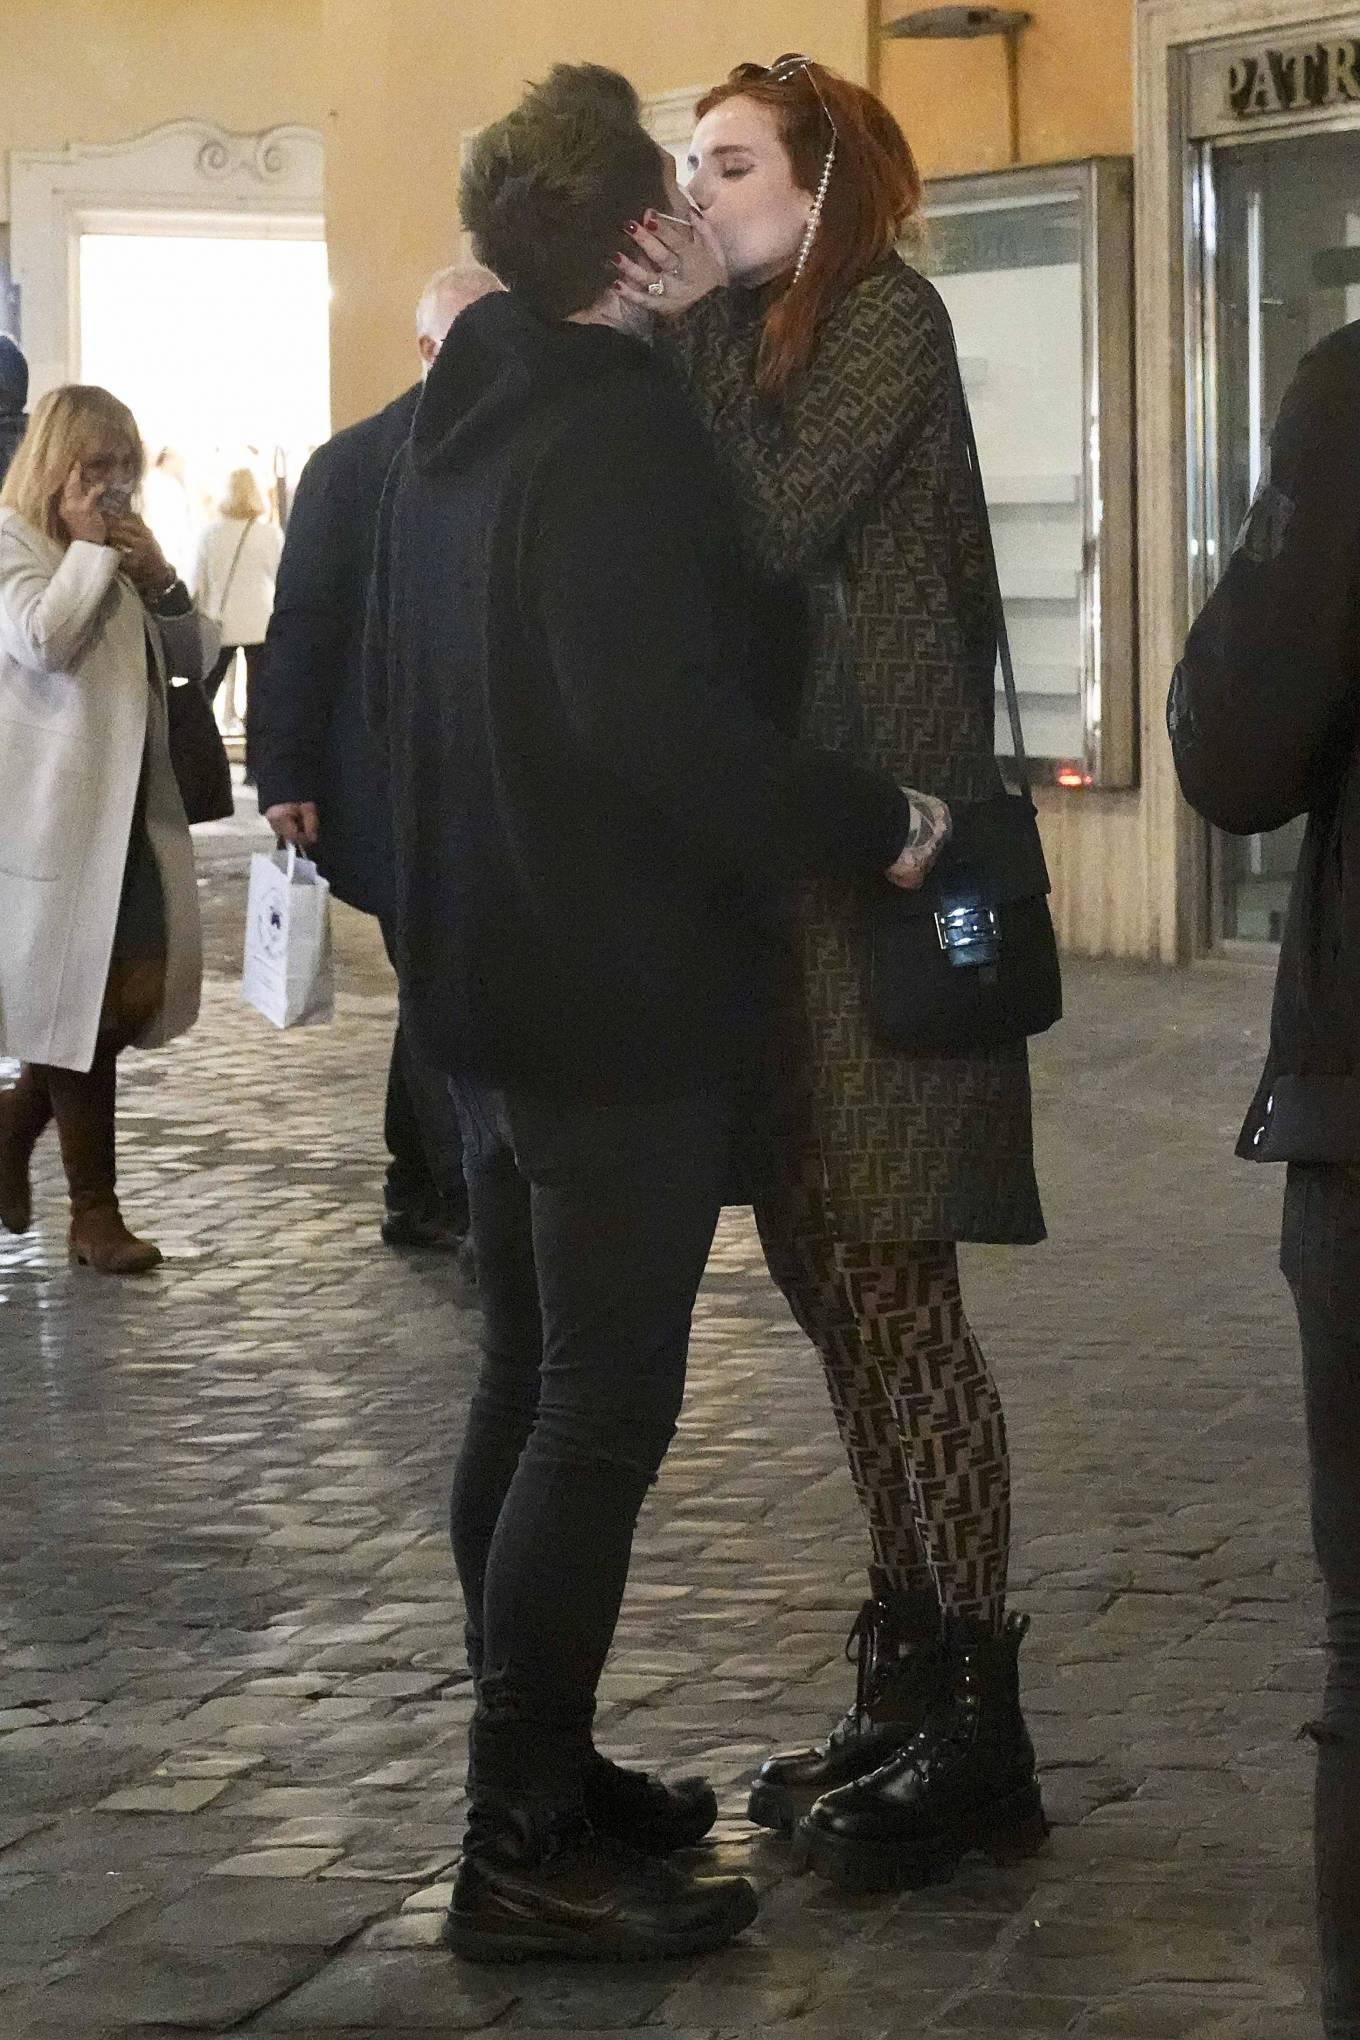 Bella Thorne on PDA with boyfriend singer Benjamin Mascolo in Rome